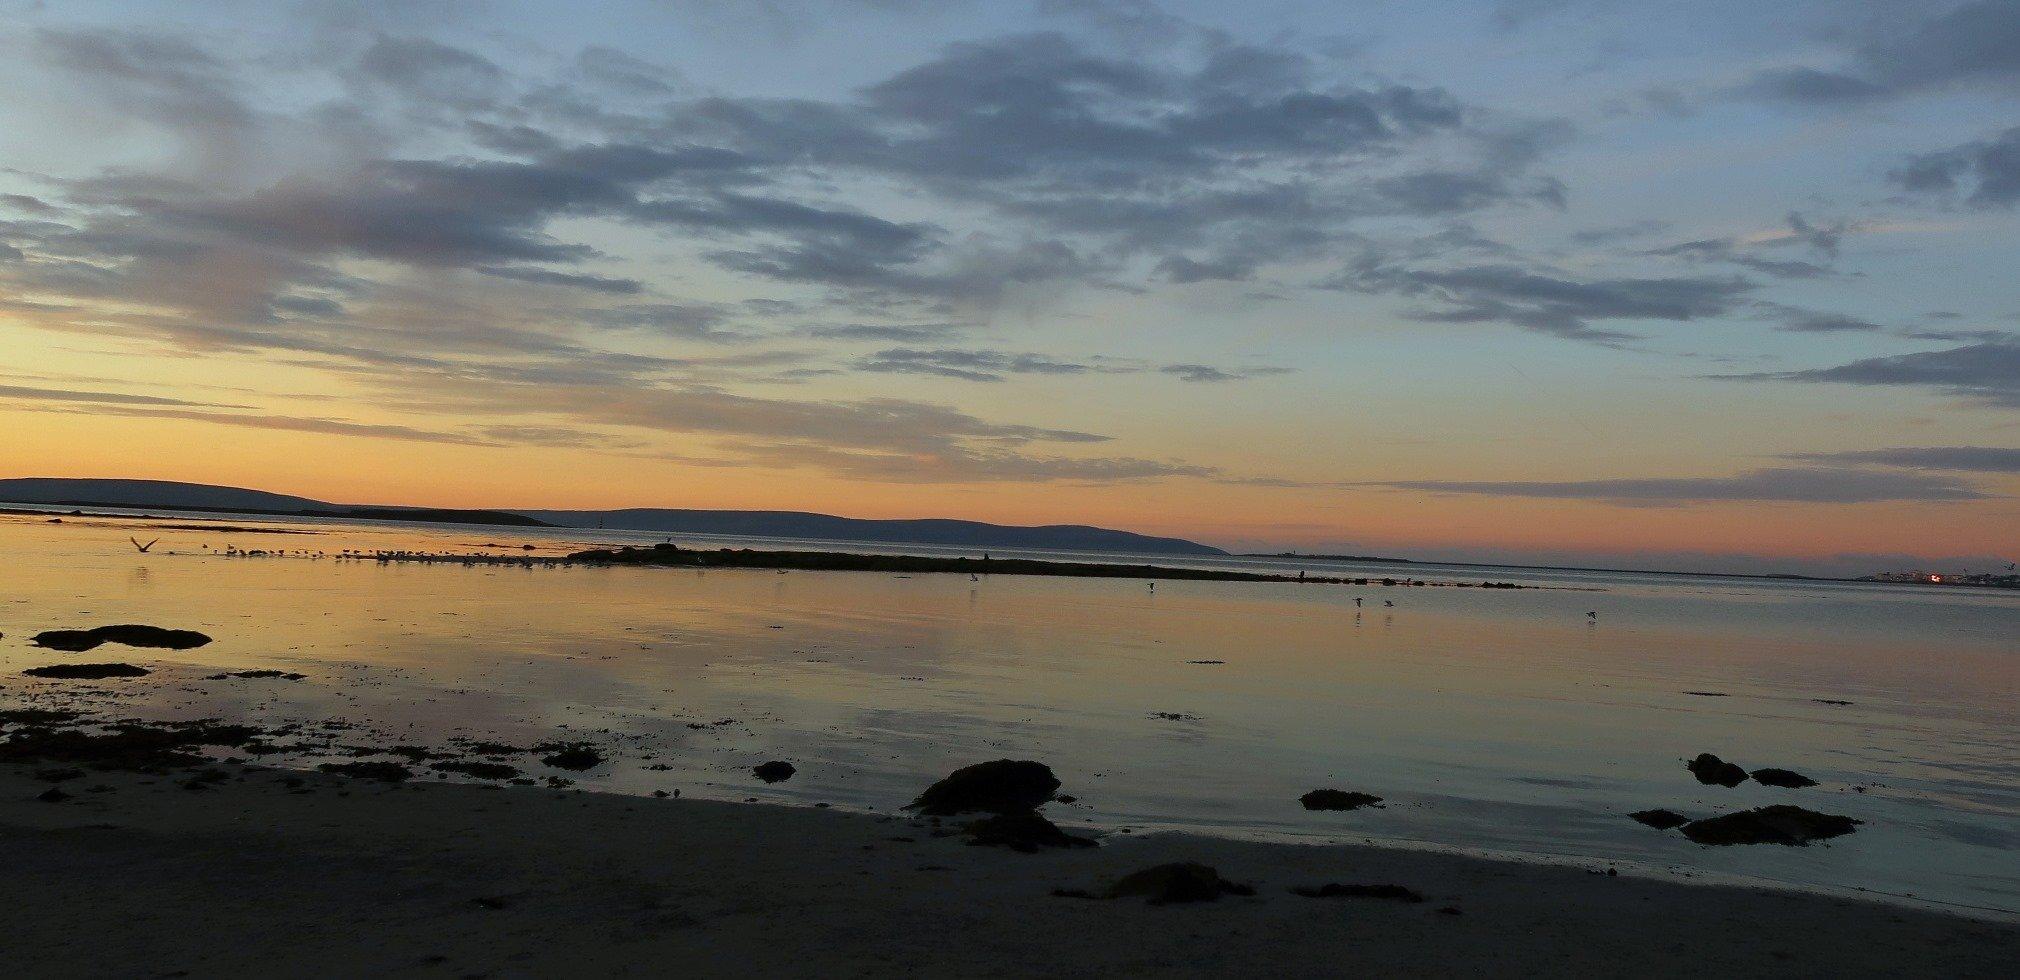 Ballyloughane Beach Galway Ireland - Visit Galway